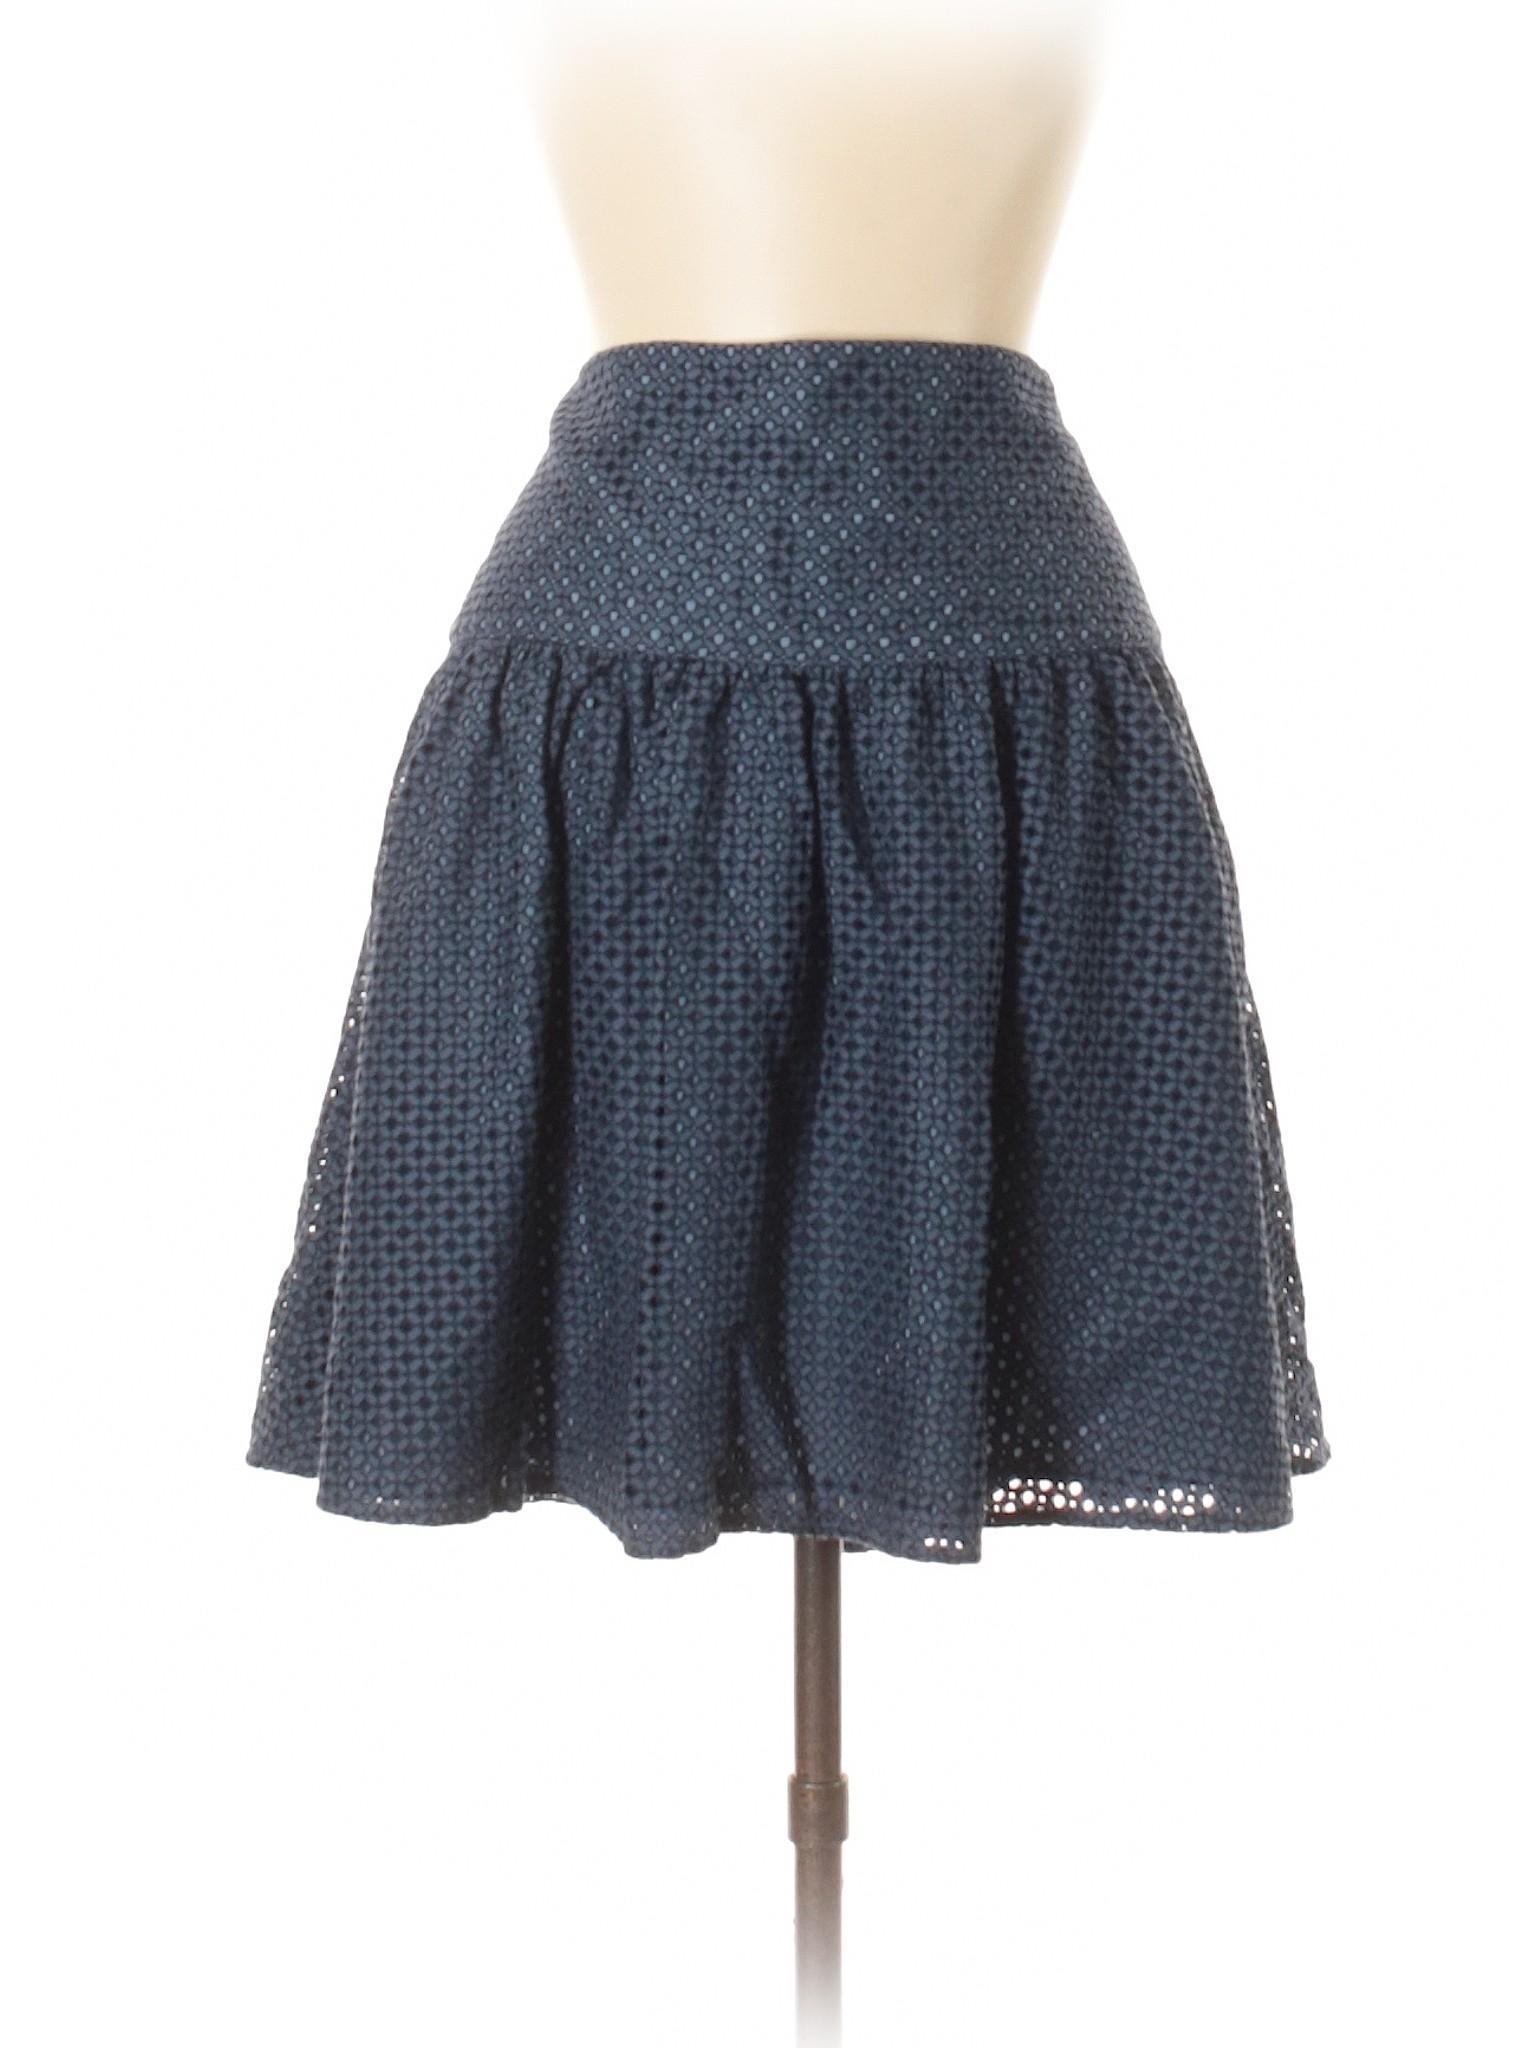 Boutique Boutique Boutique Casual Casual Skirt Skirt Boutique Boutique Boutique Casual Casual Skirt Skirt Skirt Casual 8H0YAw